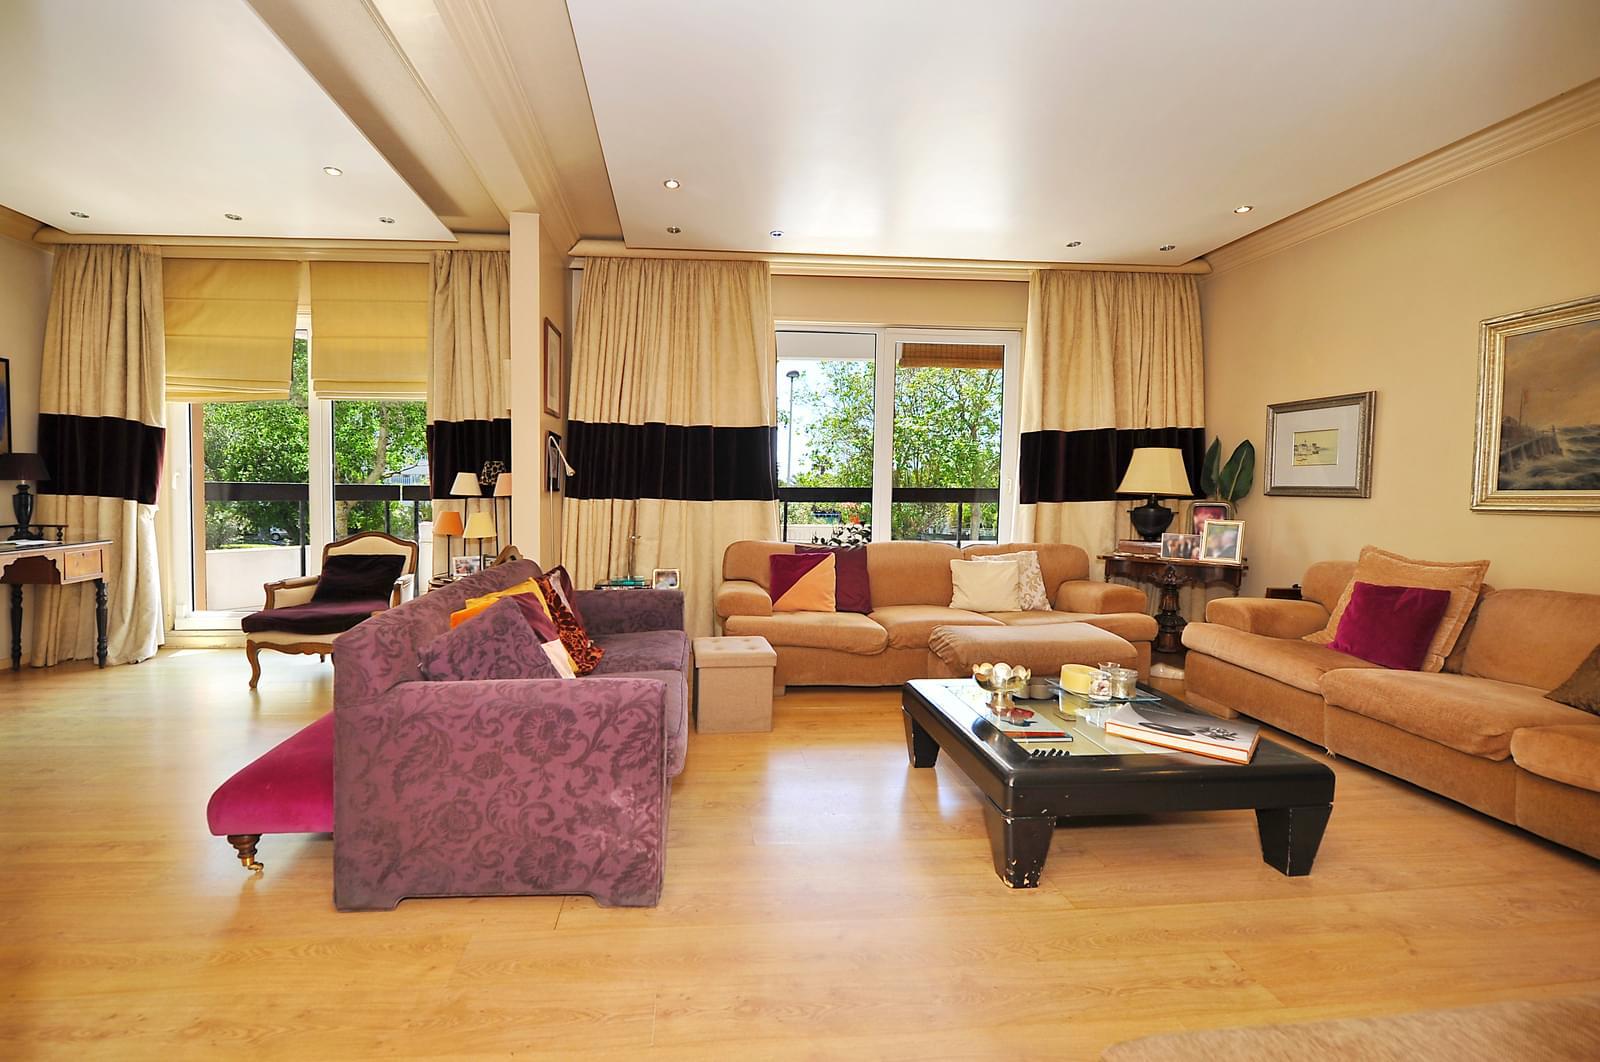 pf17071-apartamento-t4-oeiras-32cf9fa5-7b28-4db5-9565-00640affdba2